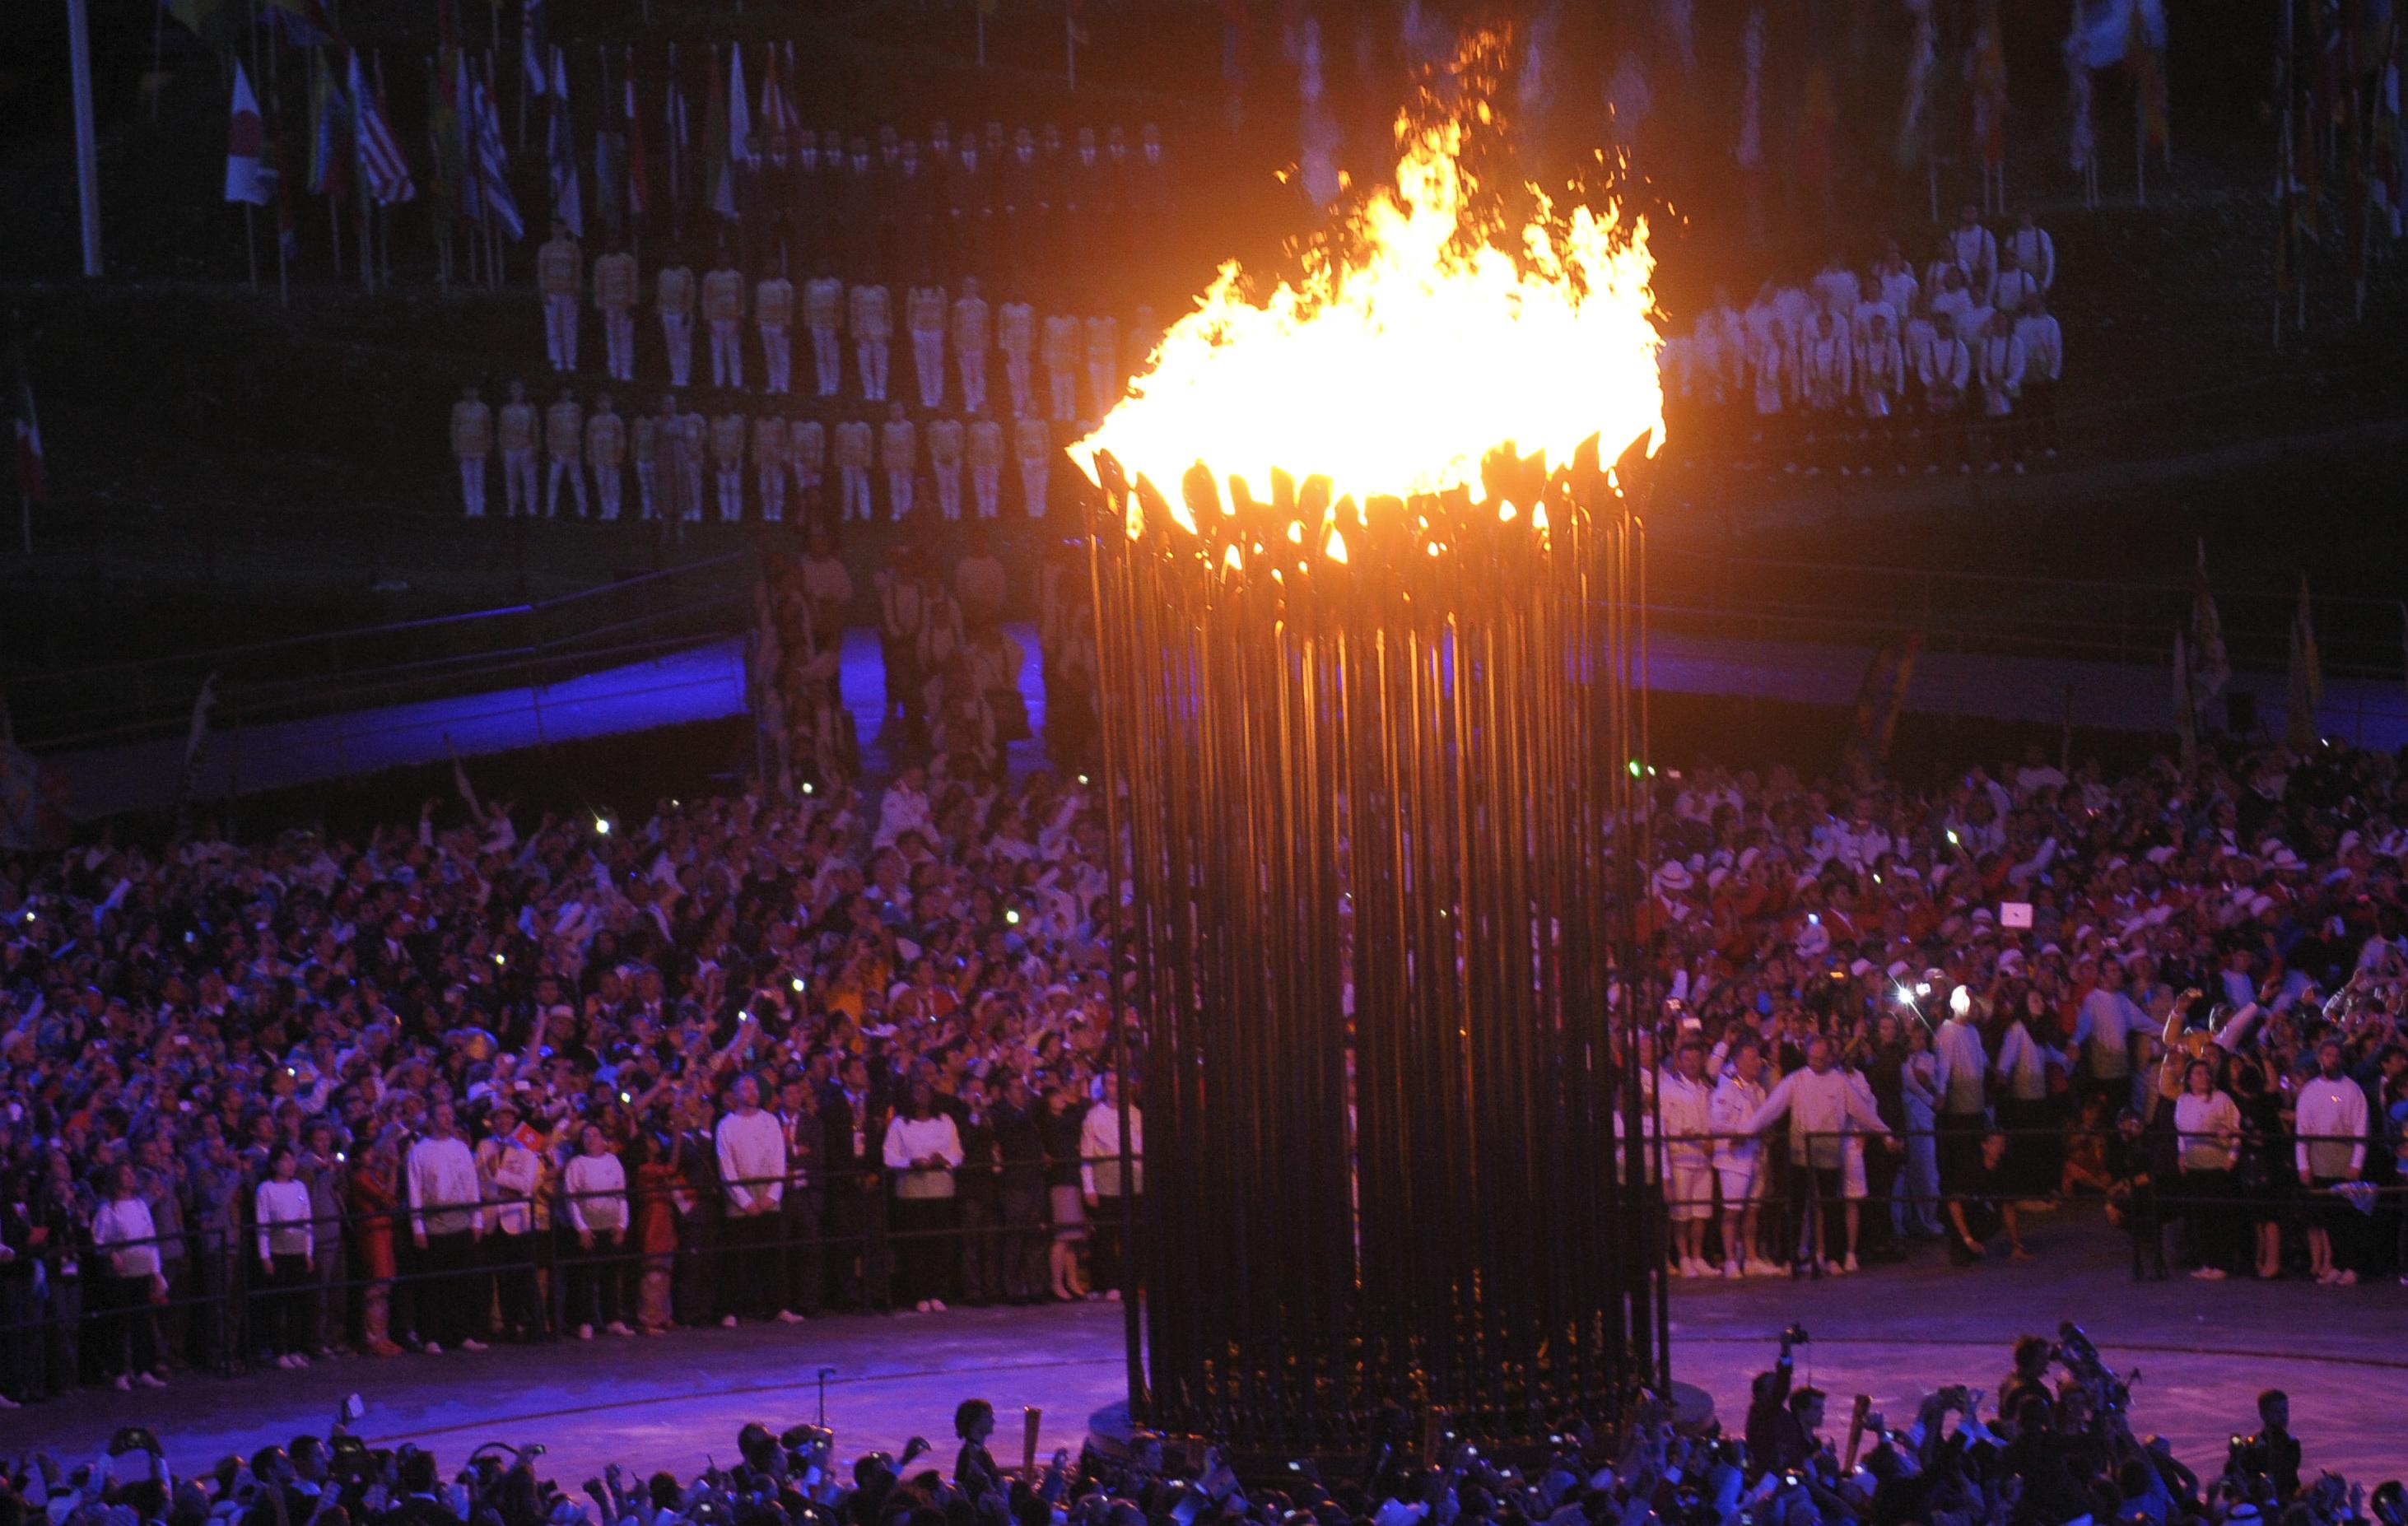 Jeux olympique flamm coloriage - Flamme olympique dessin ...